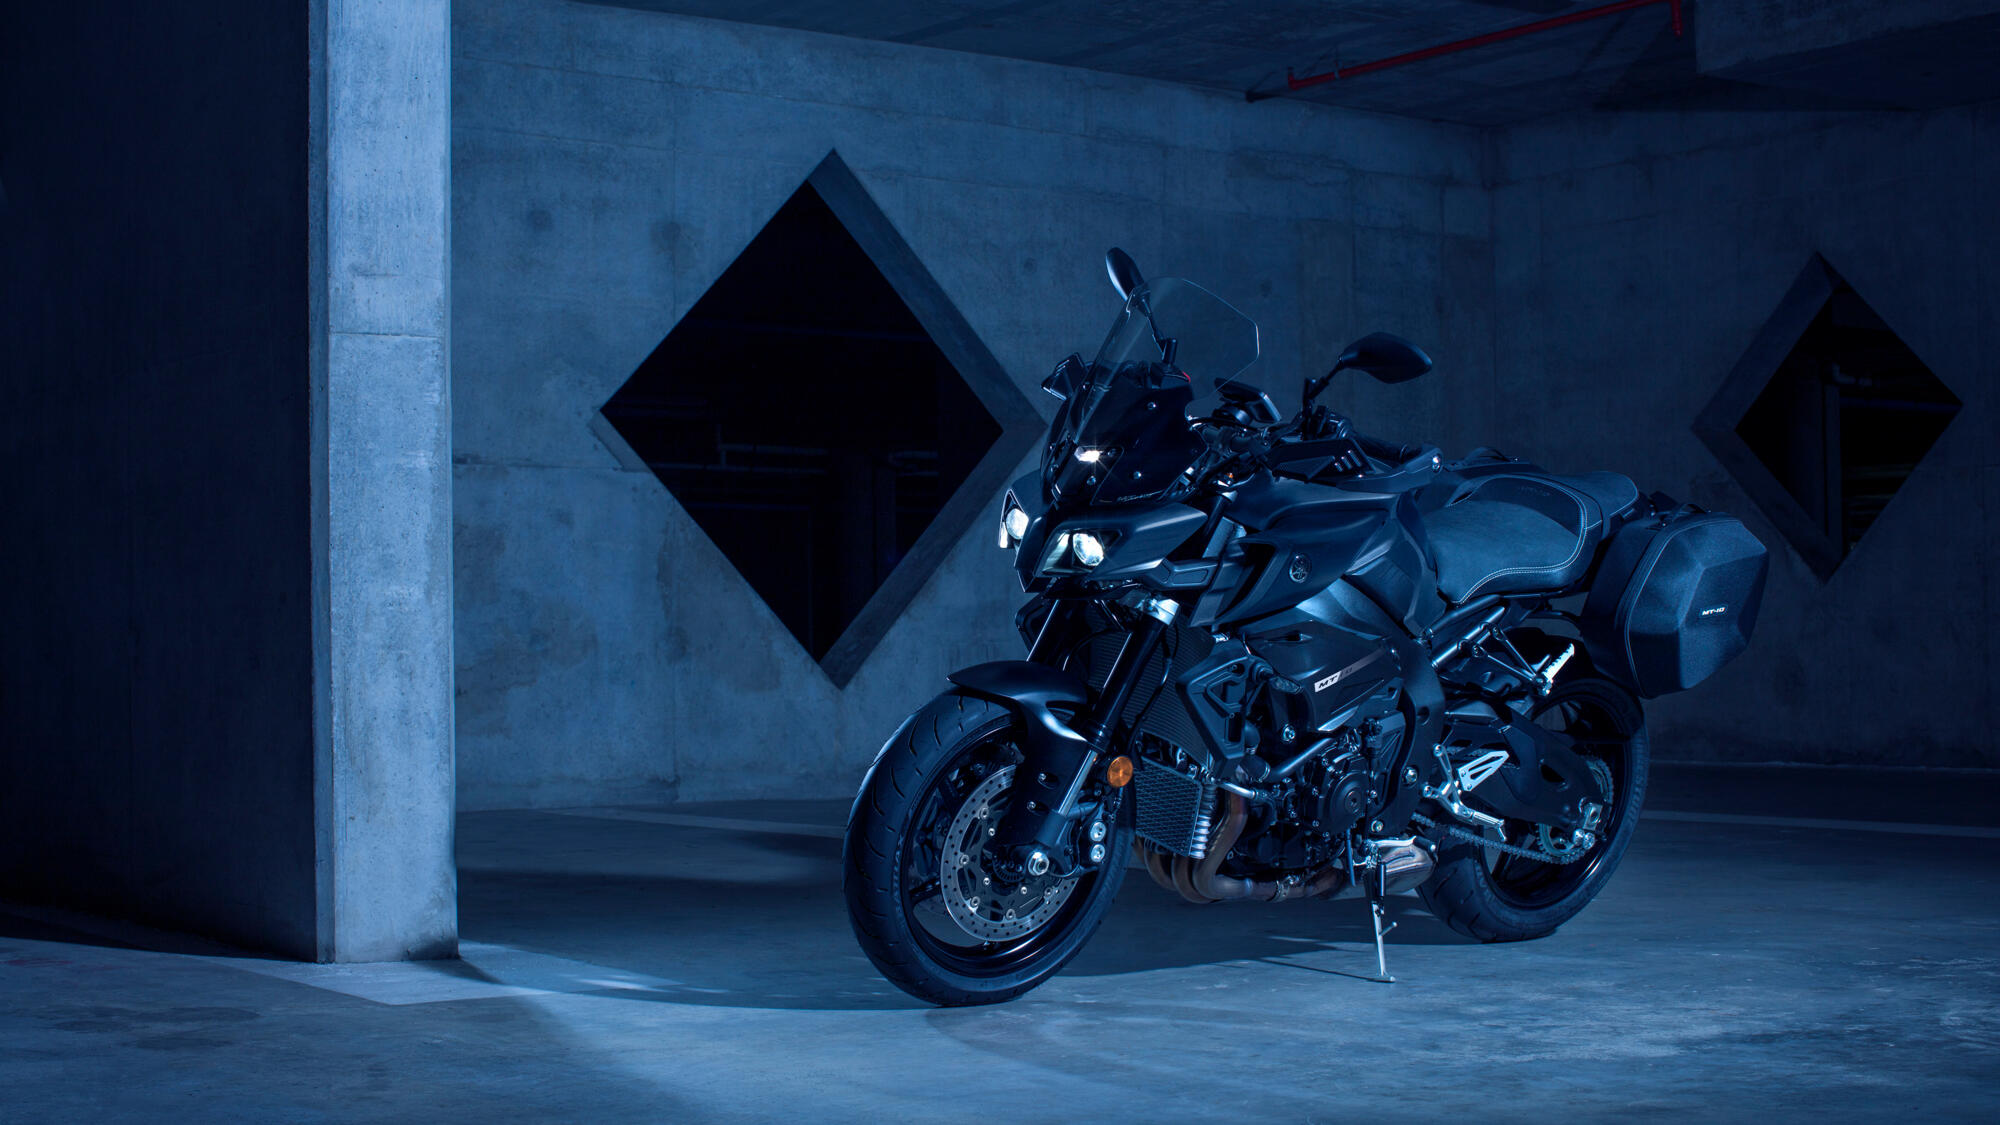 MT-10 Tourer Edition - motorcycles - Yamaha Motor